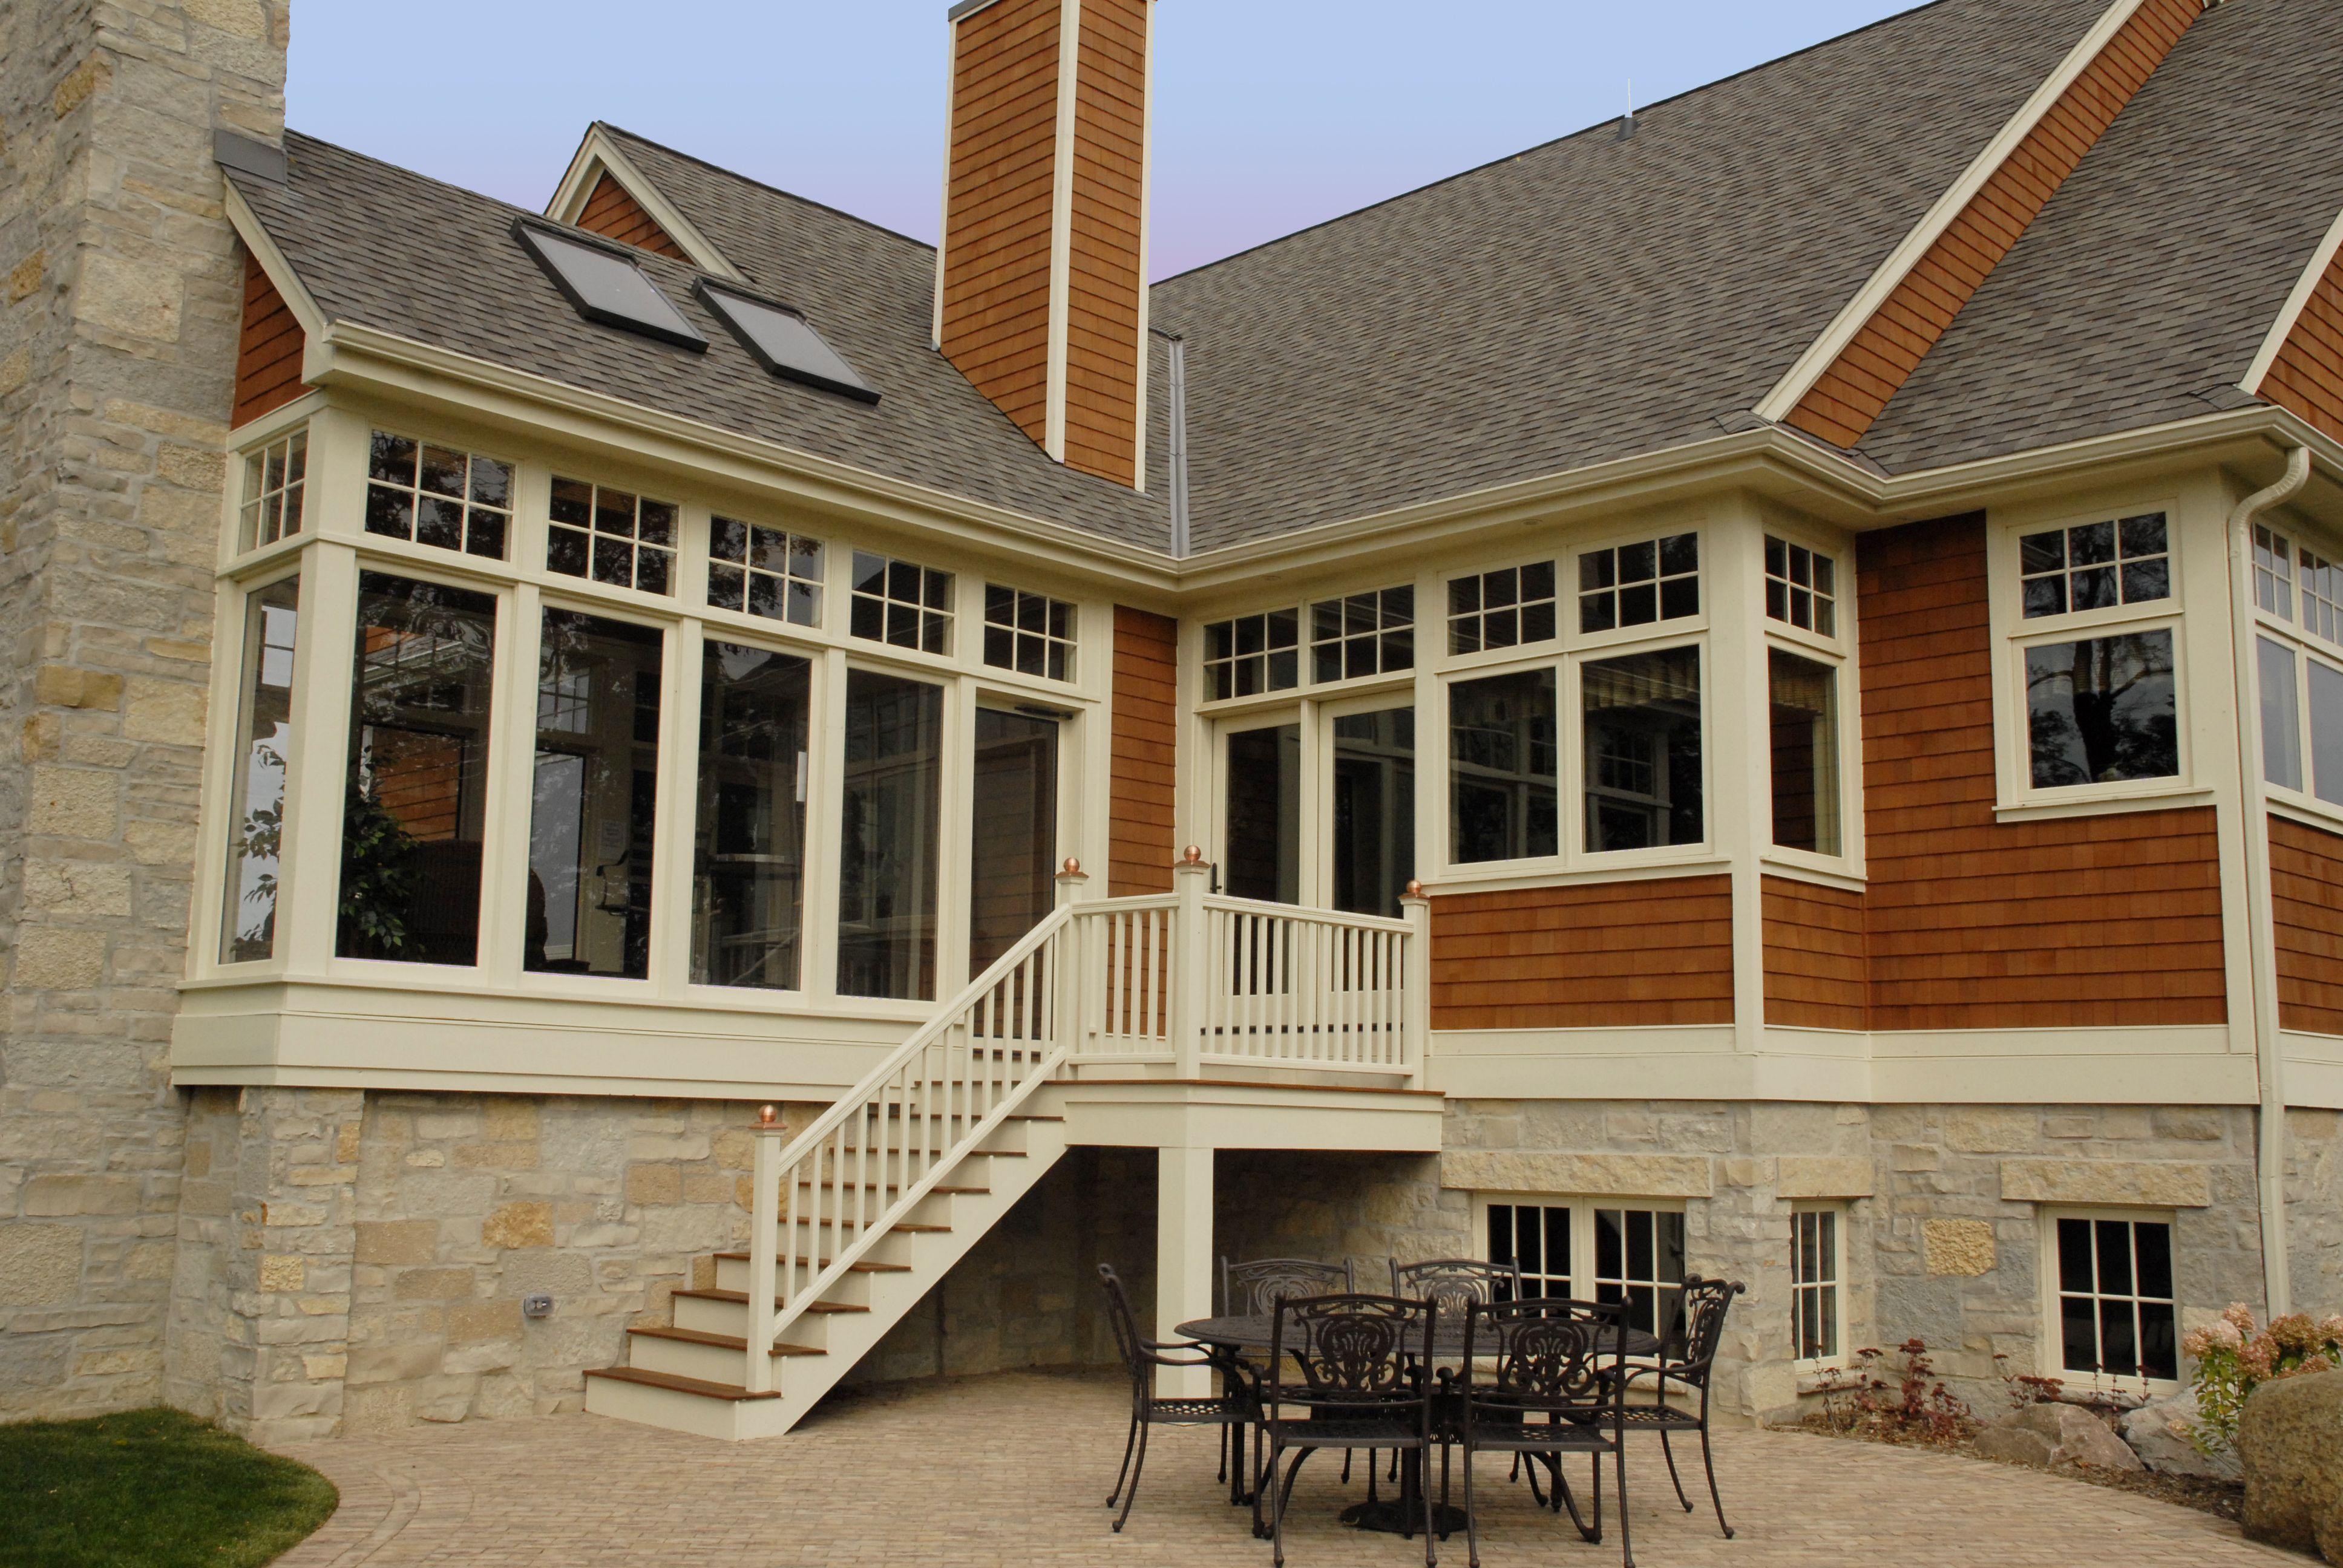 exterior 4 seasons room talus pinterest room porch and sunroom